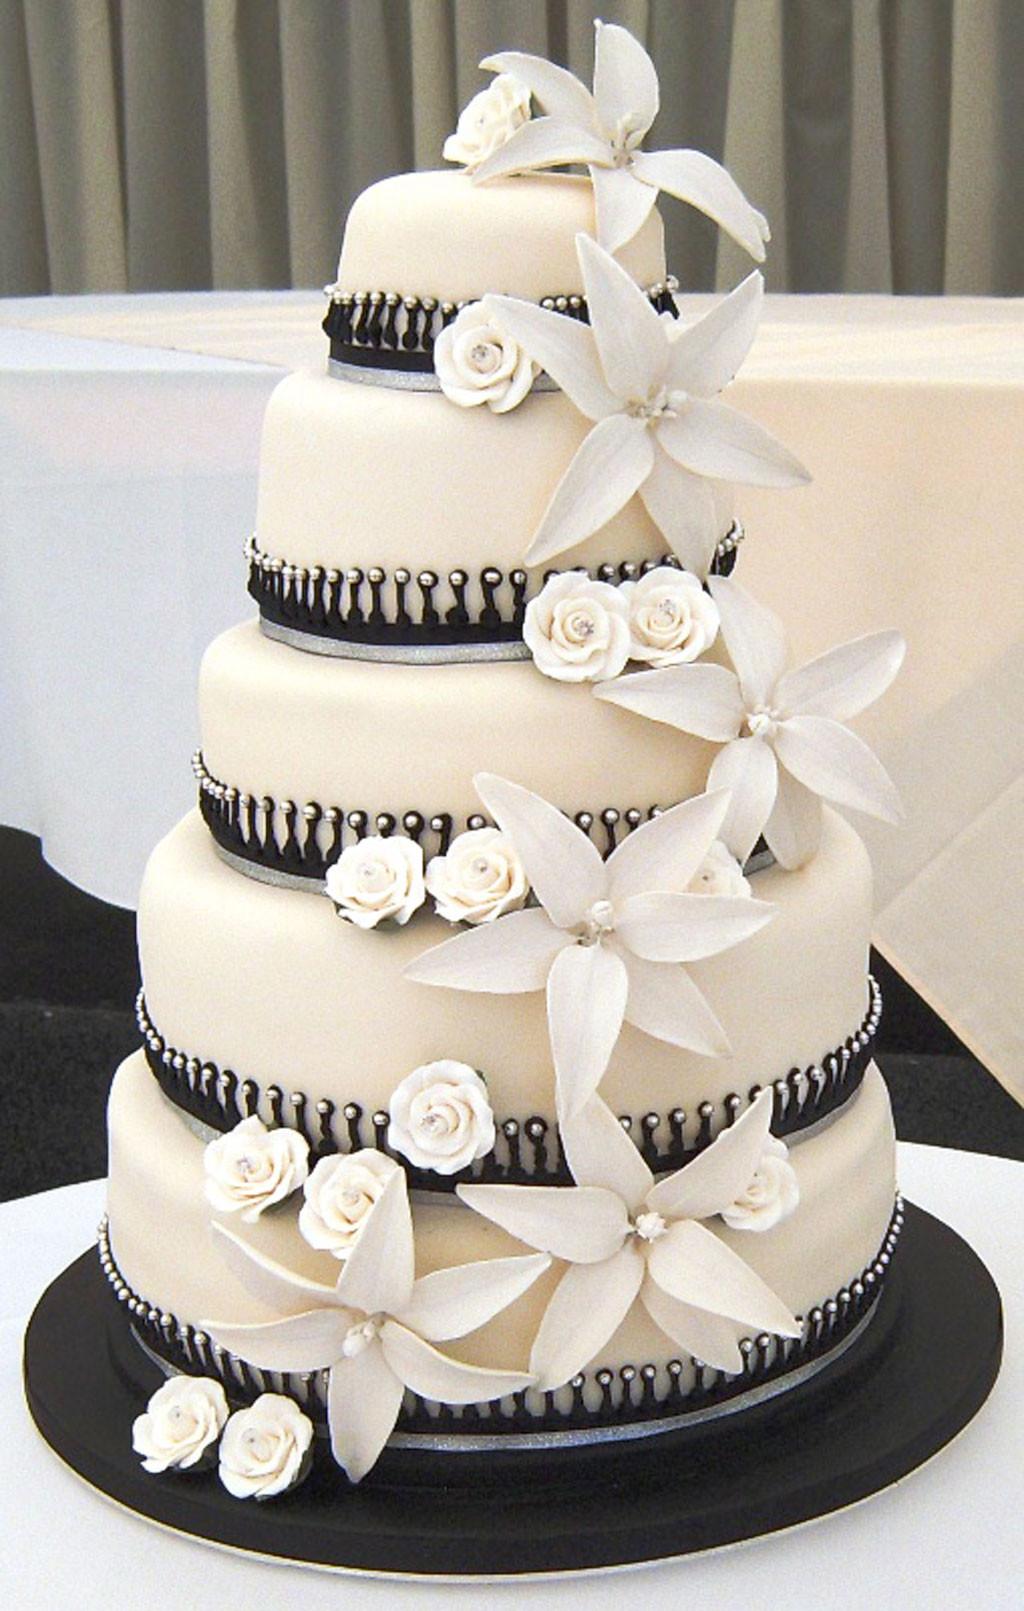 Cakes Design For Wedding  Black White Wedding Cake Designs Wedding Cake Cake Ideas